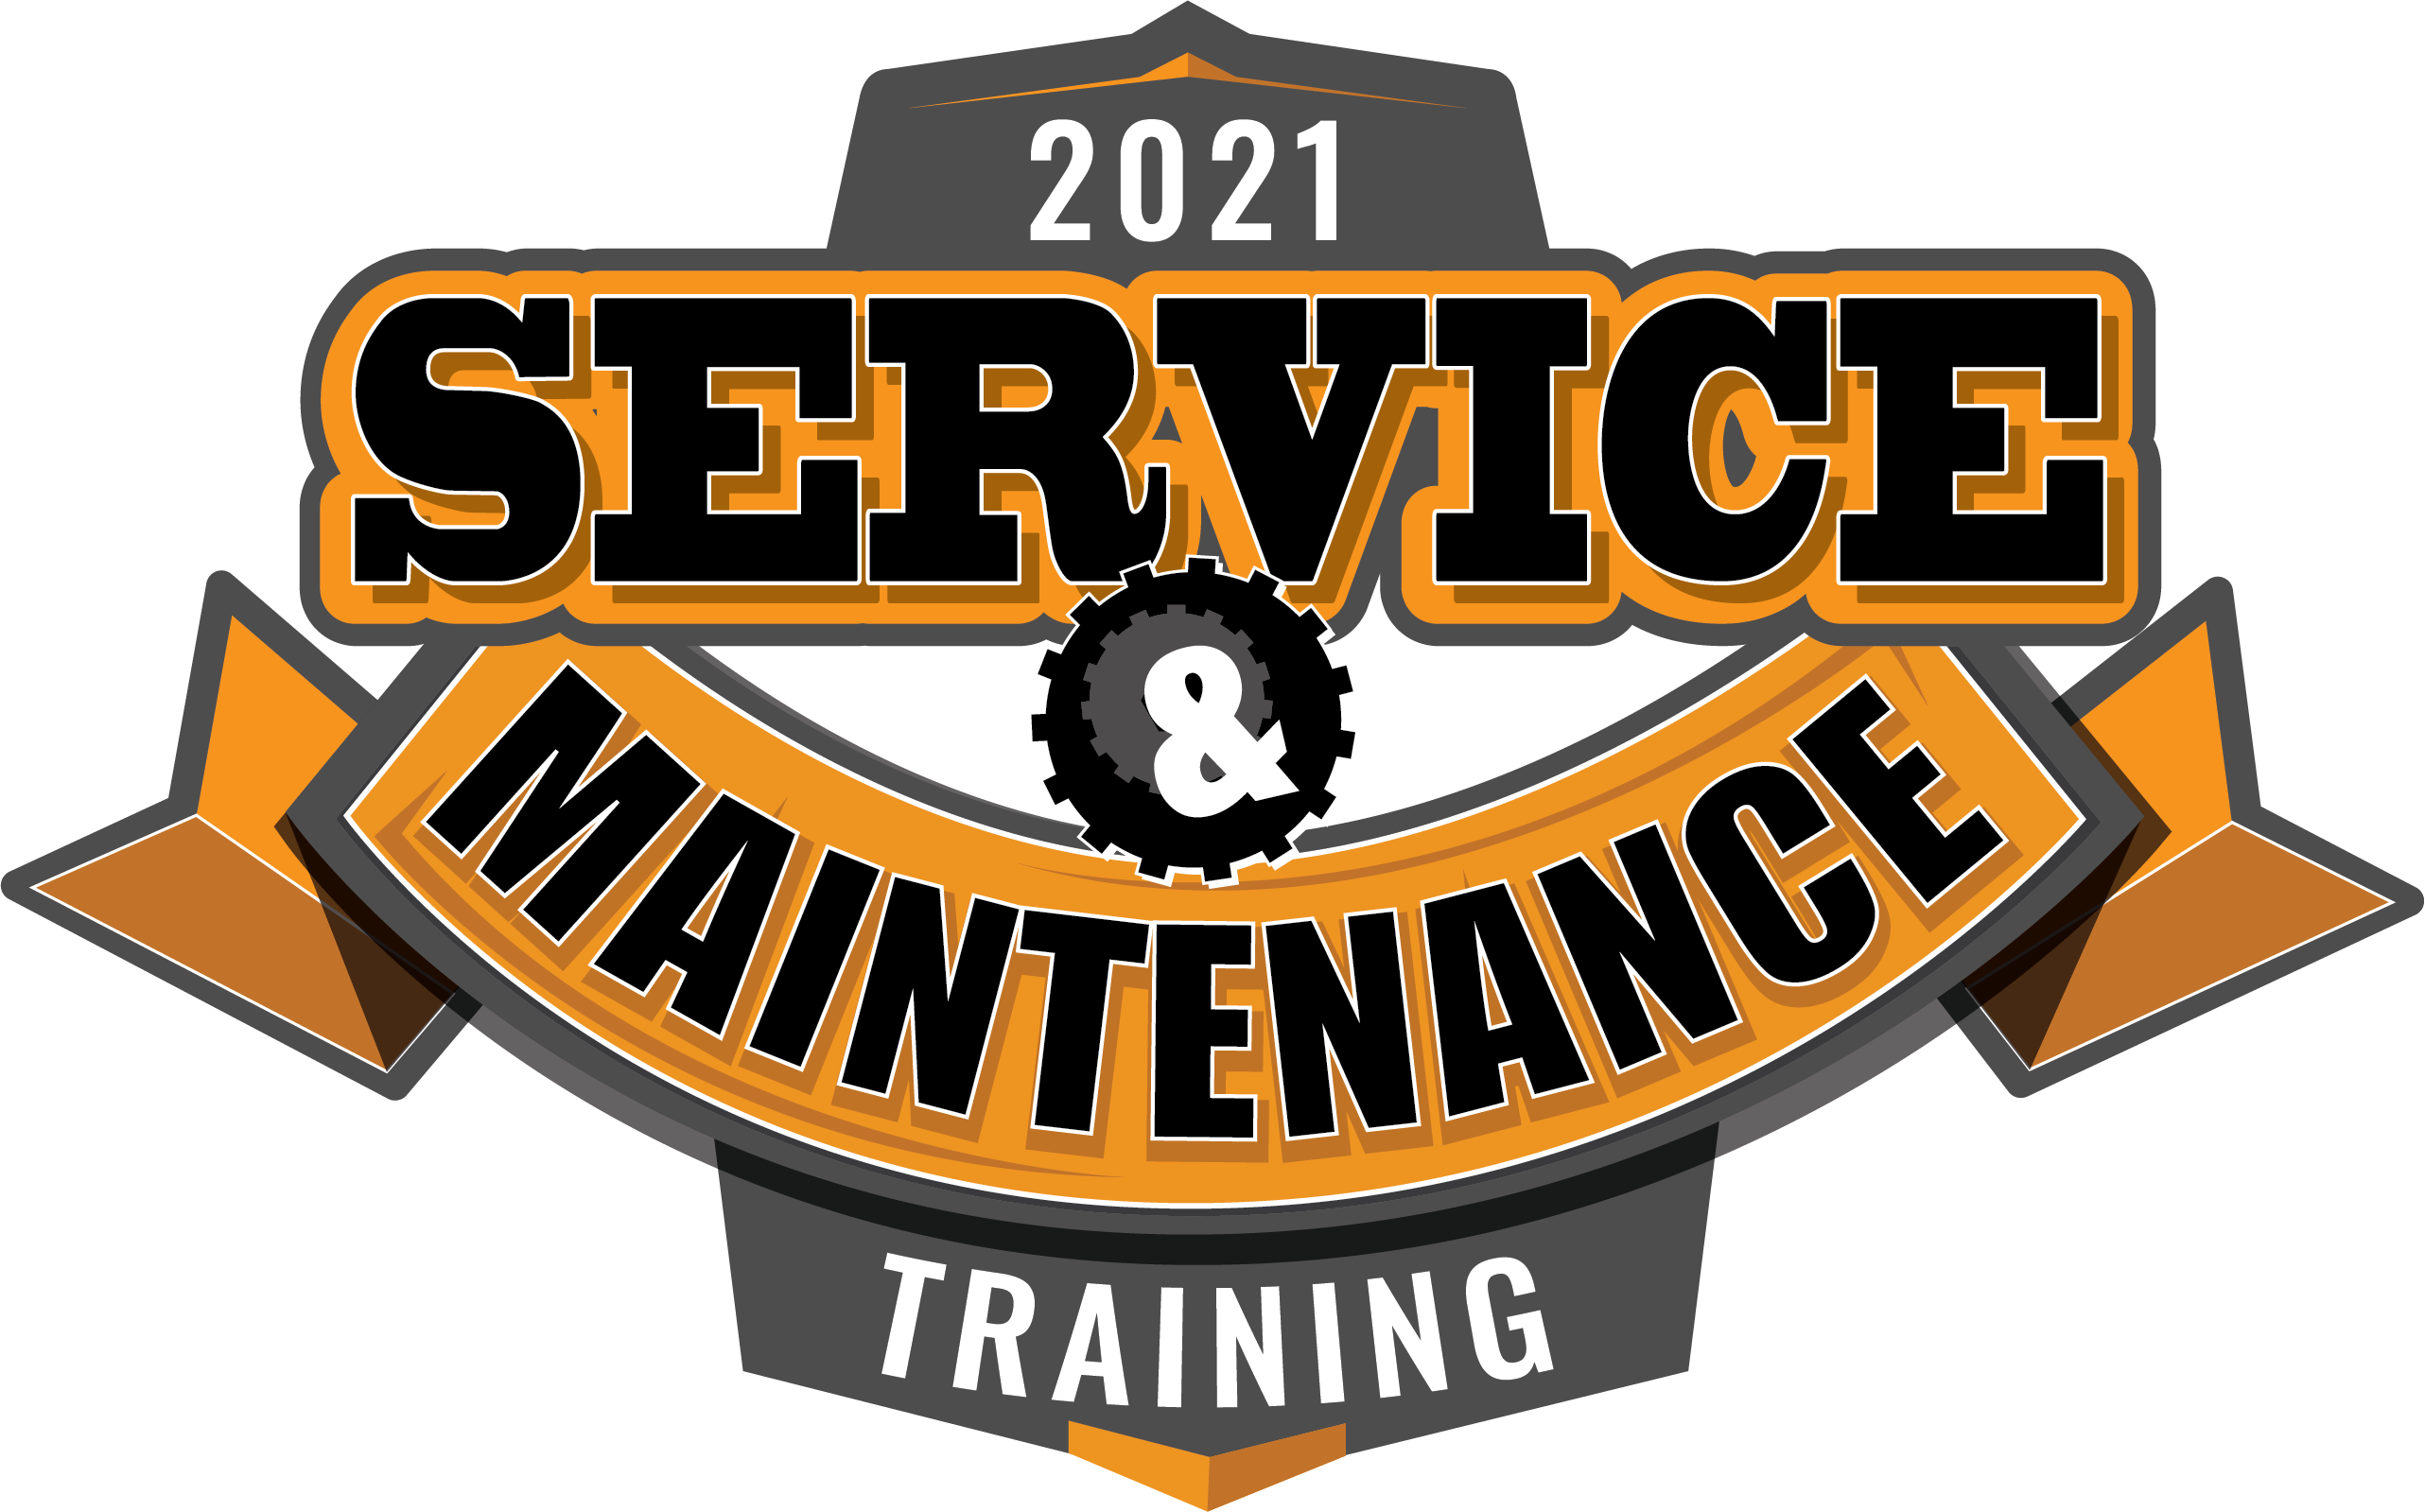 2021-service-maintenance-logo.png